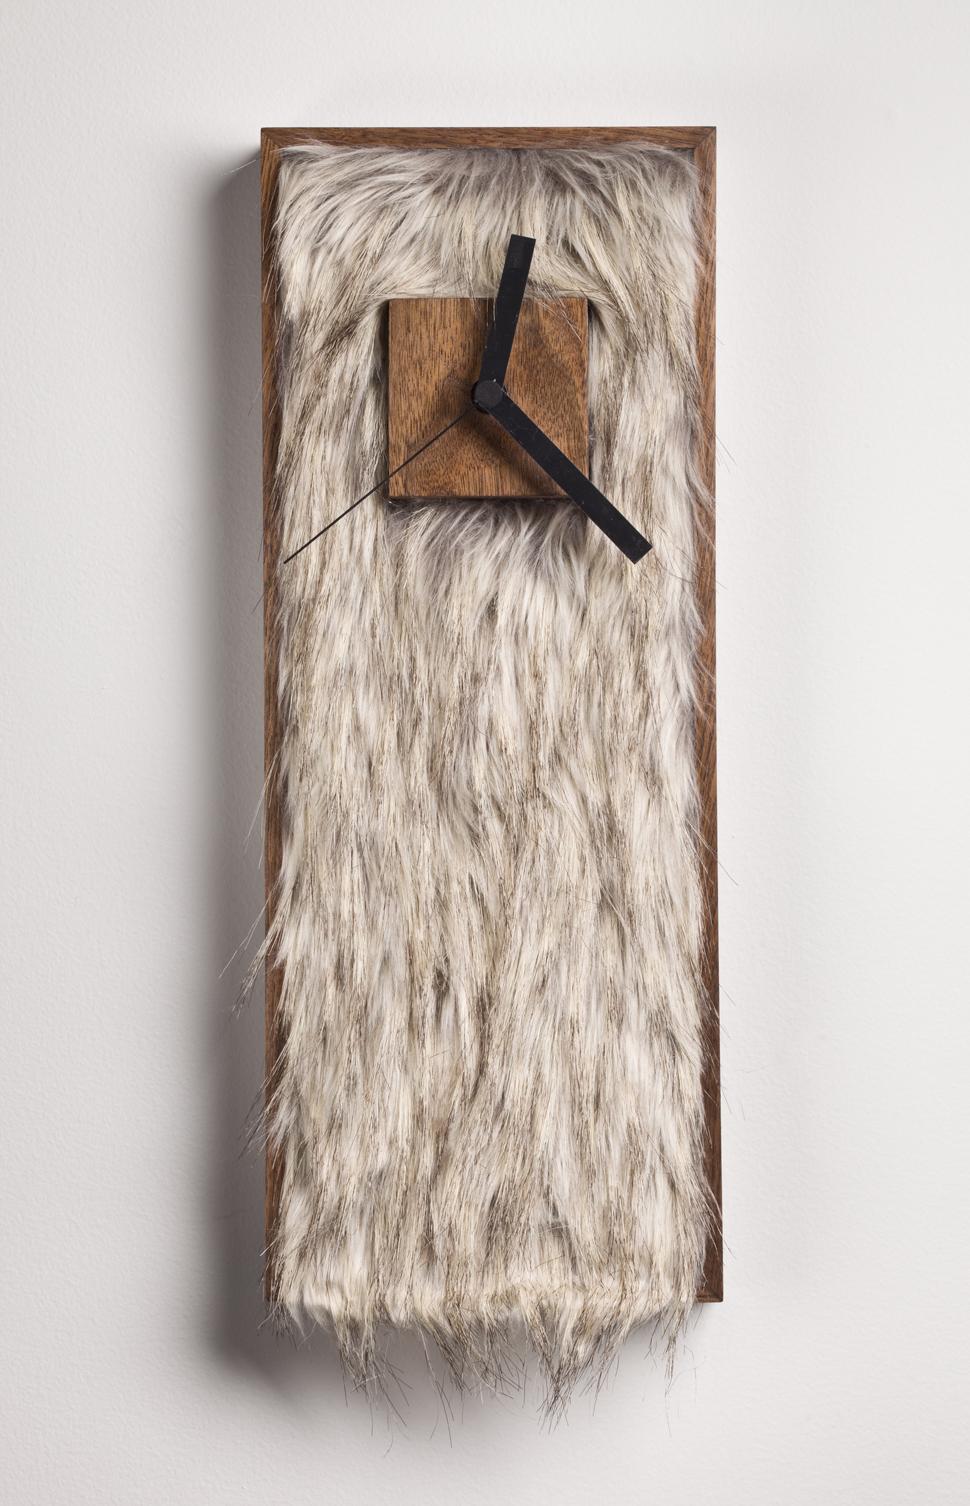 Mark Dineen - Fur Series One, Clock